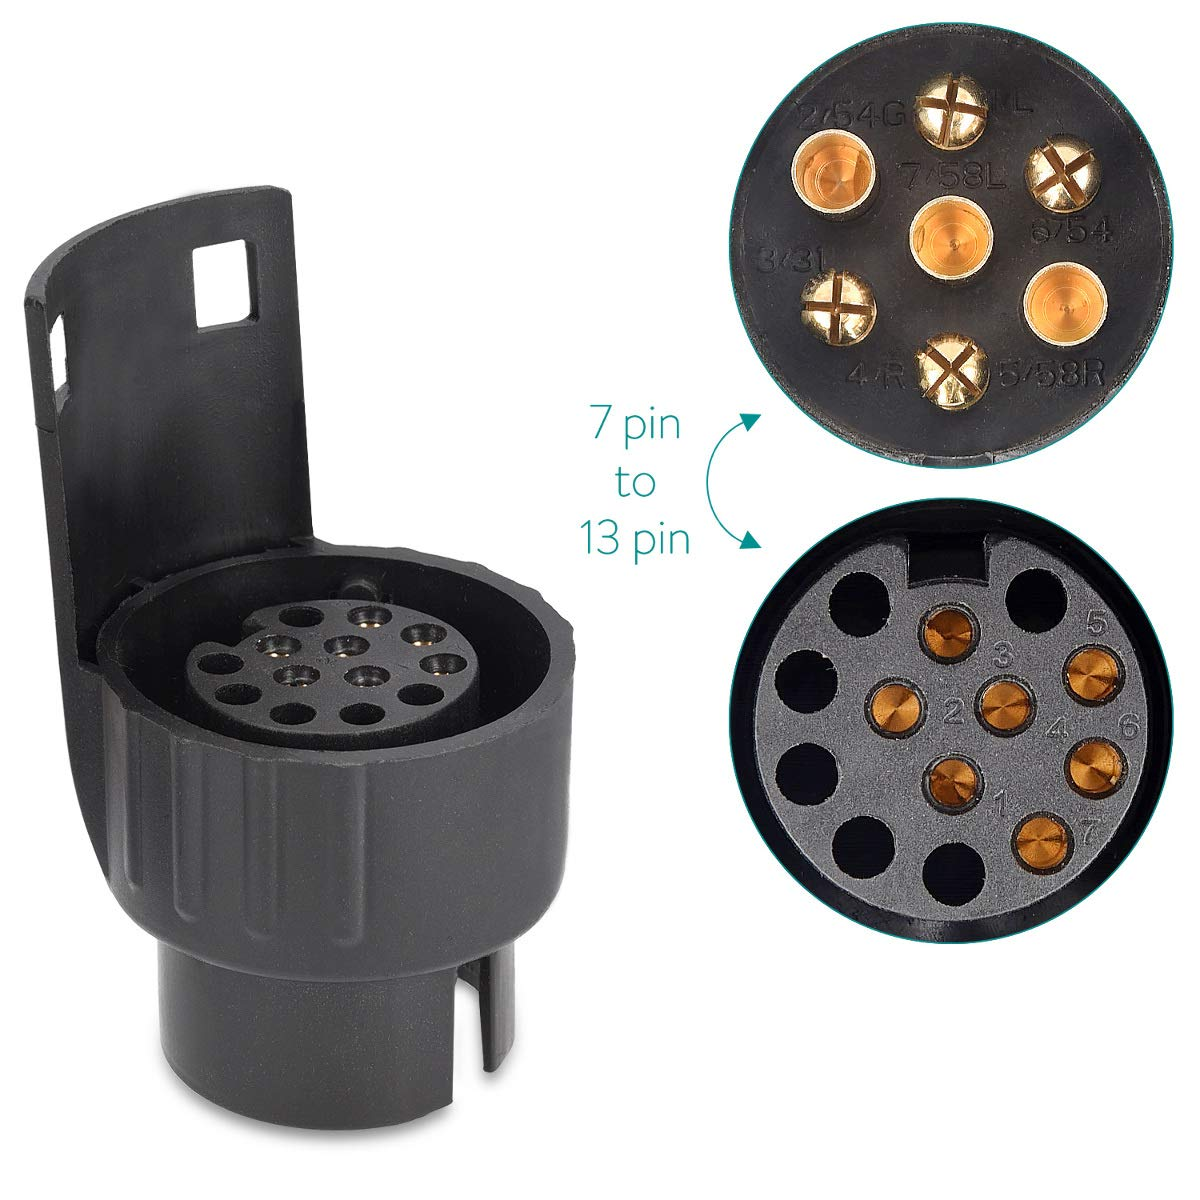 Convert 7 Pin to 13 Pin for Light 12V Adapter for Car Trailer Caravan Truck Towbar Socket Navaris Trailer Adapter 7 Pin to 13 Pin Black Power